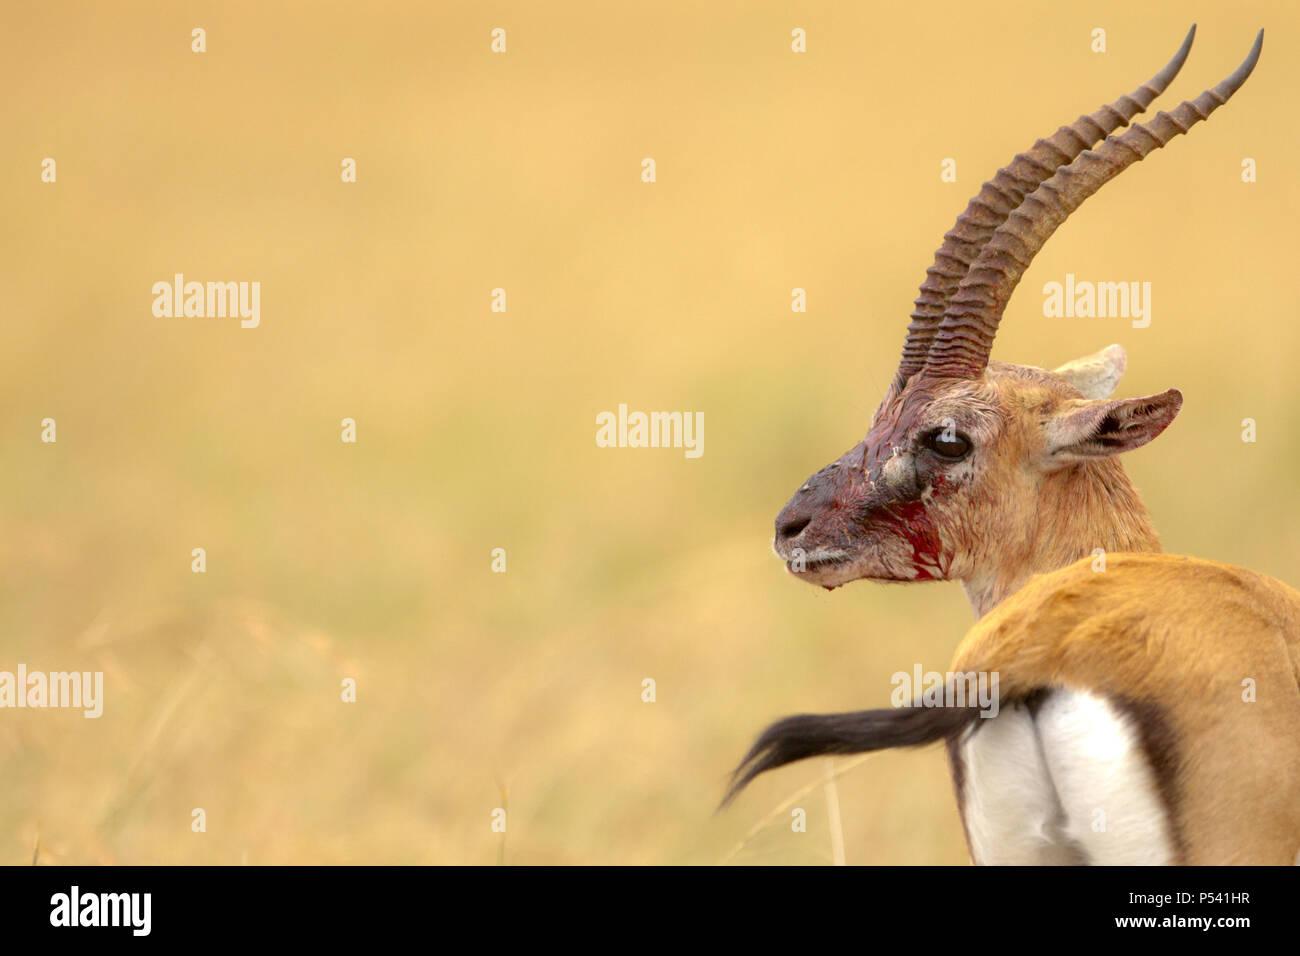 Injured Thomsons gazelle in blood - Stock Image